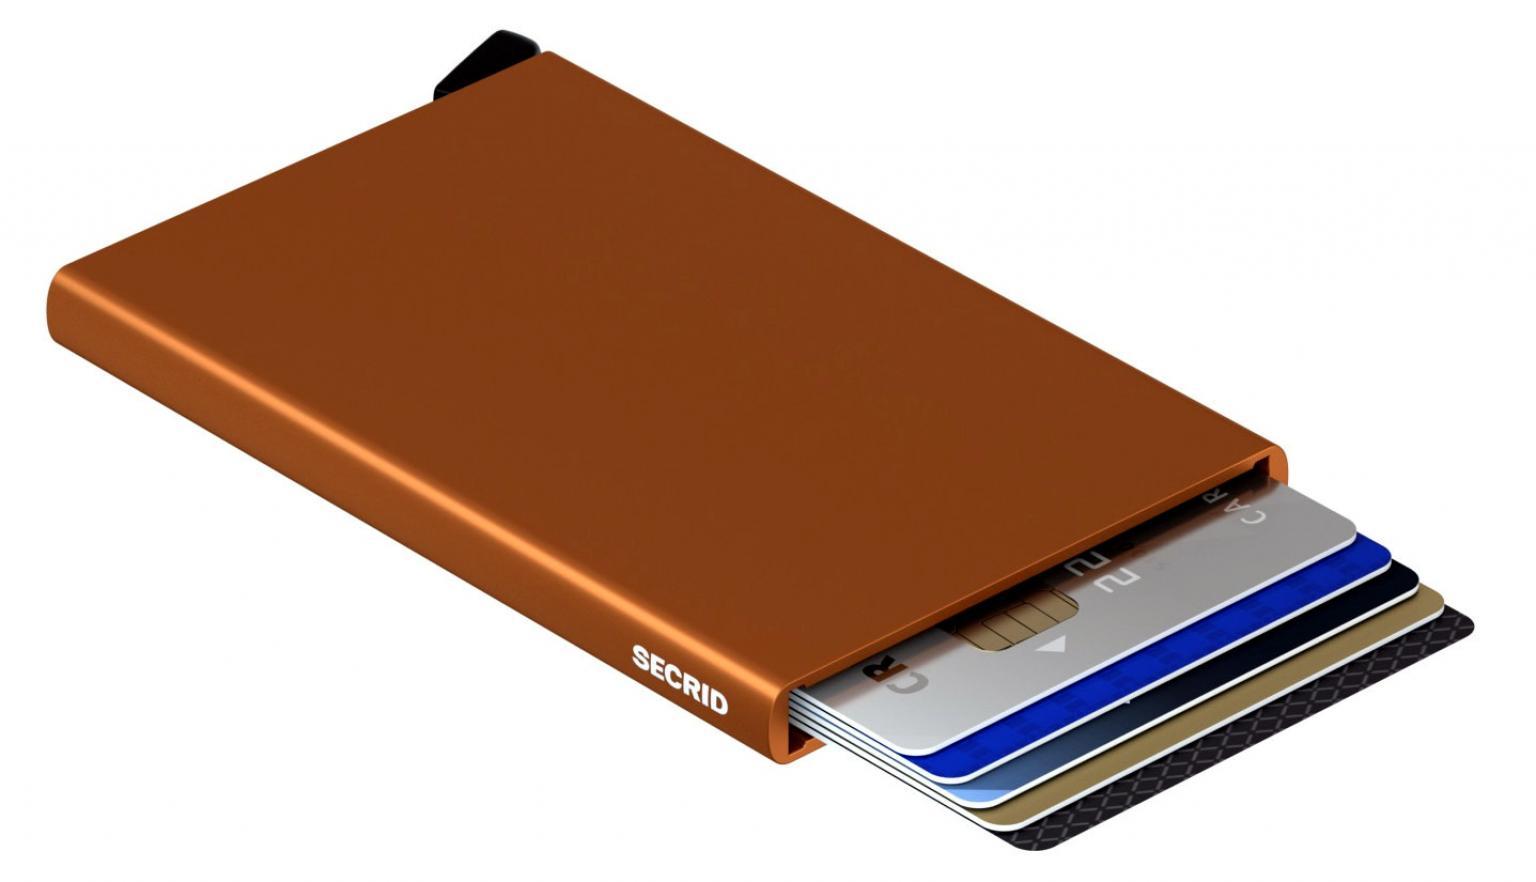 Secrid Cardprotector Metallkartenhülle RFID Rust